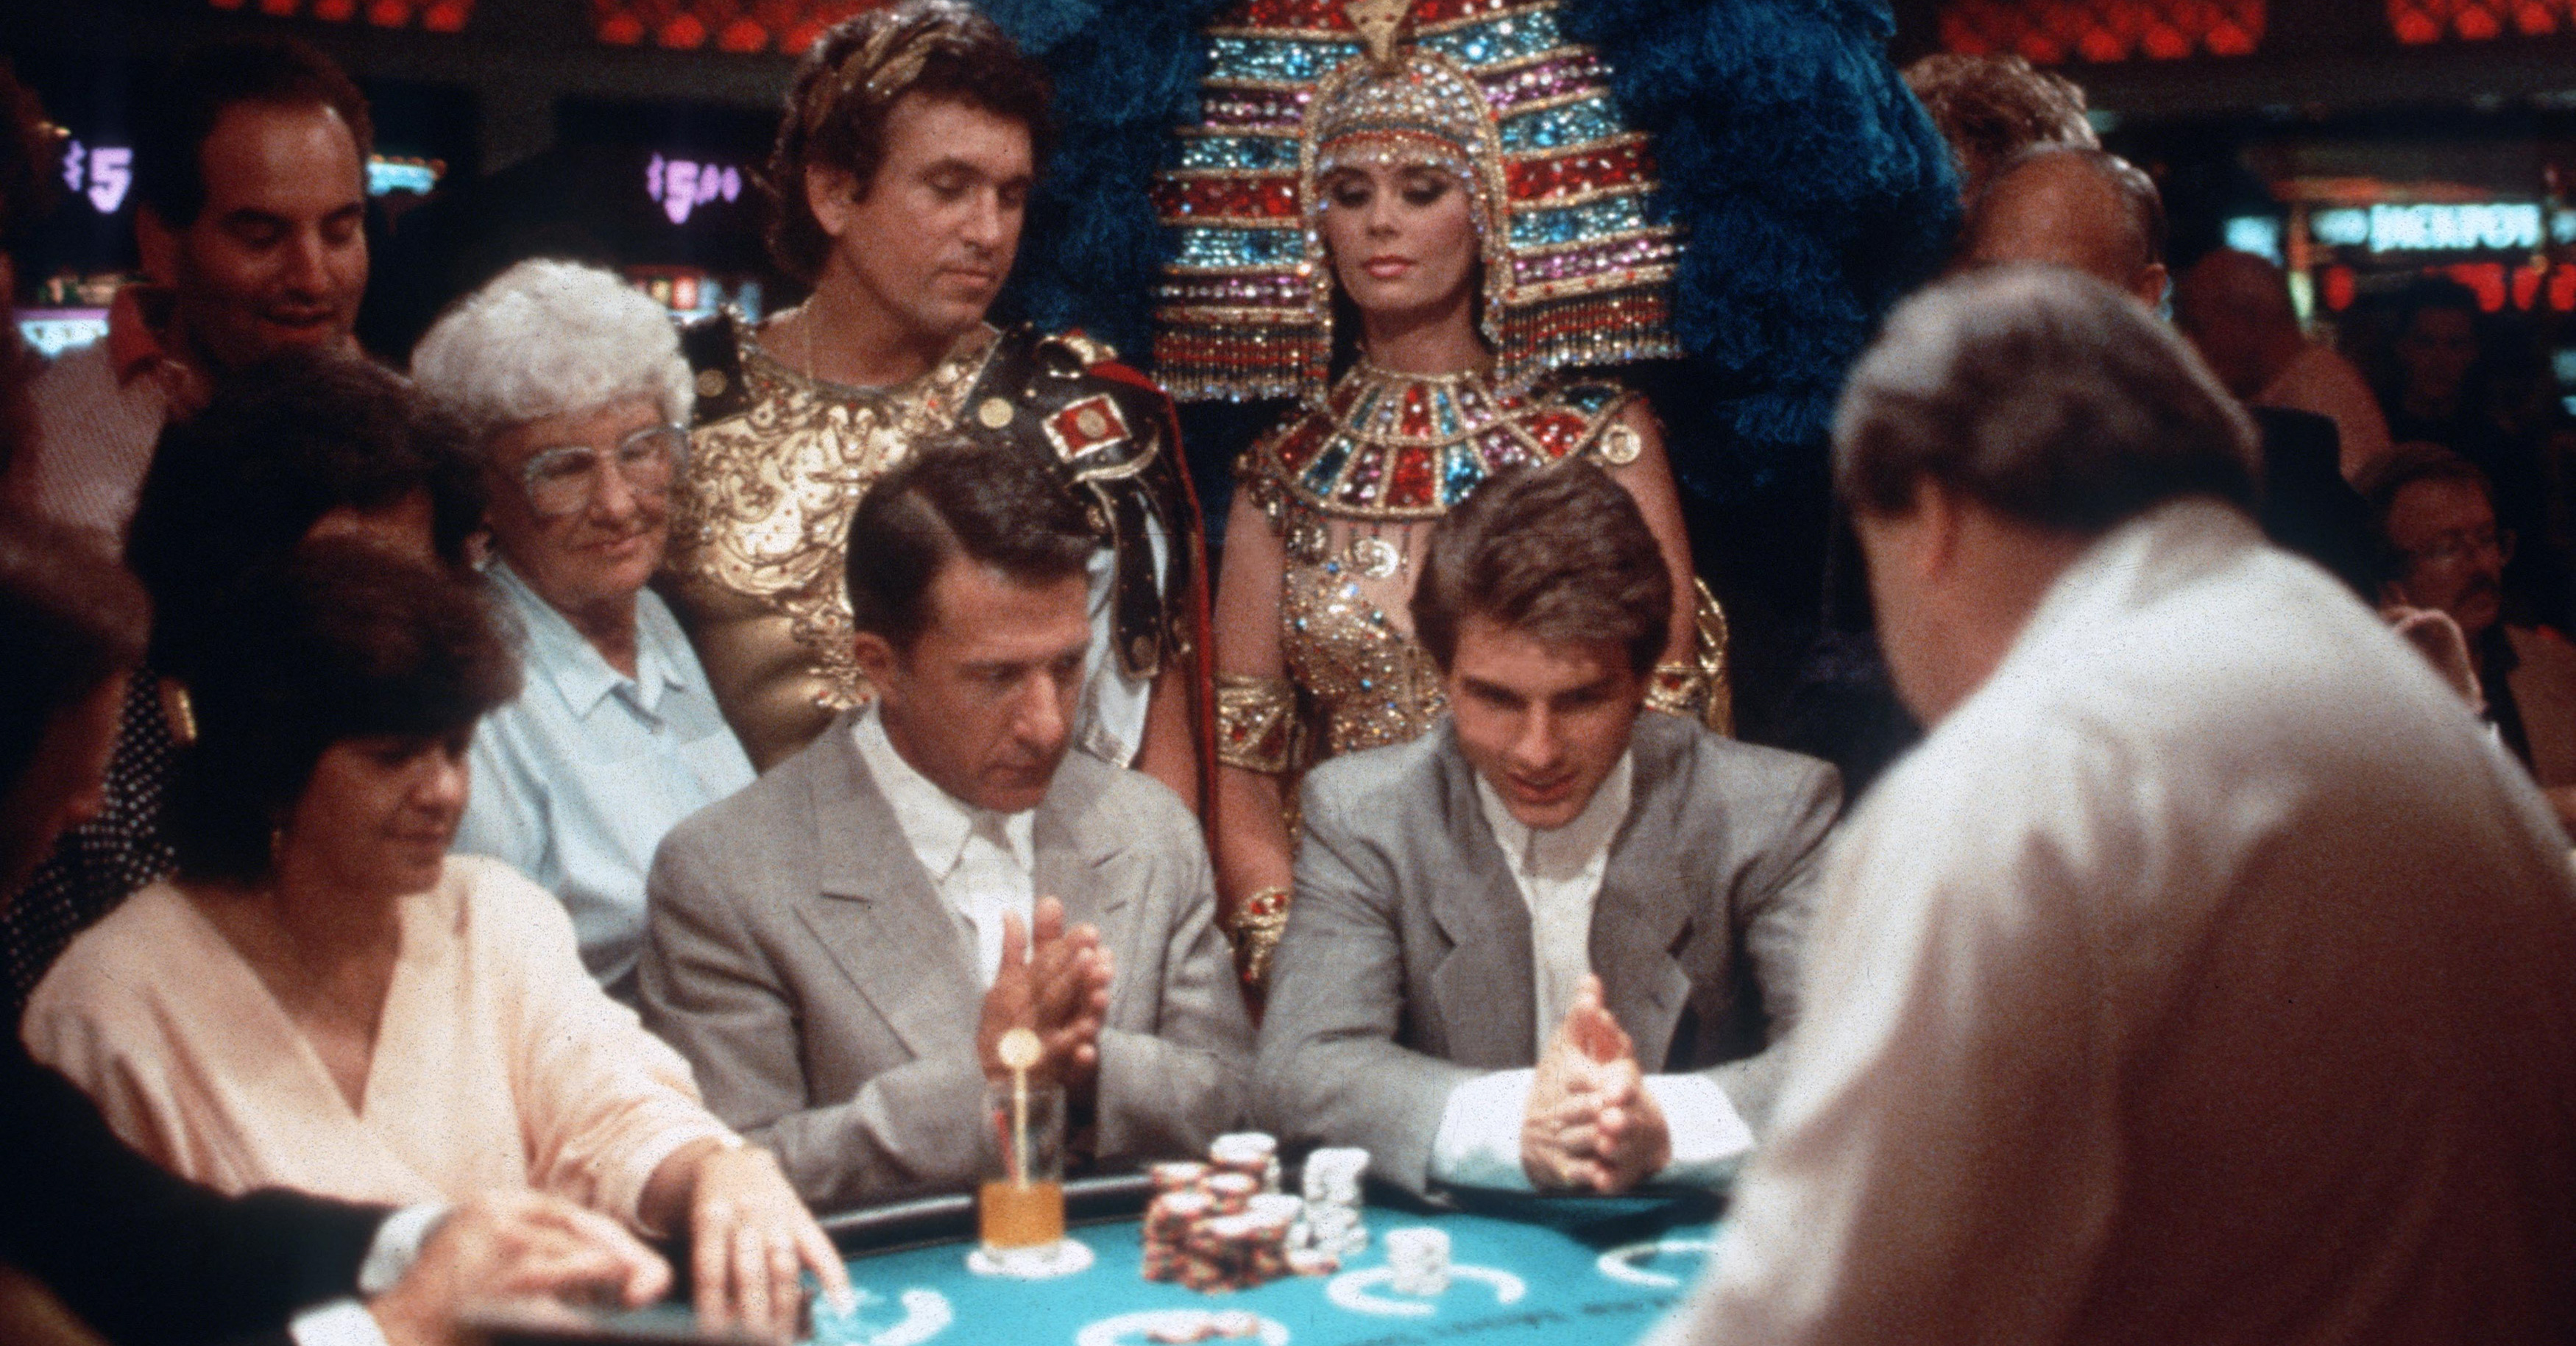 Blackjack slot machines for sale